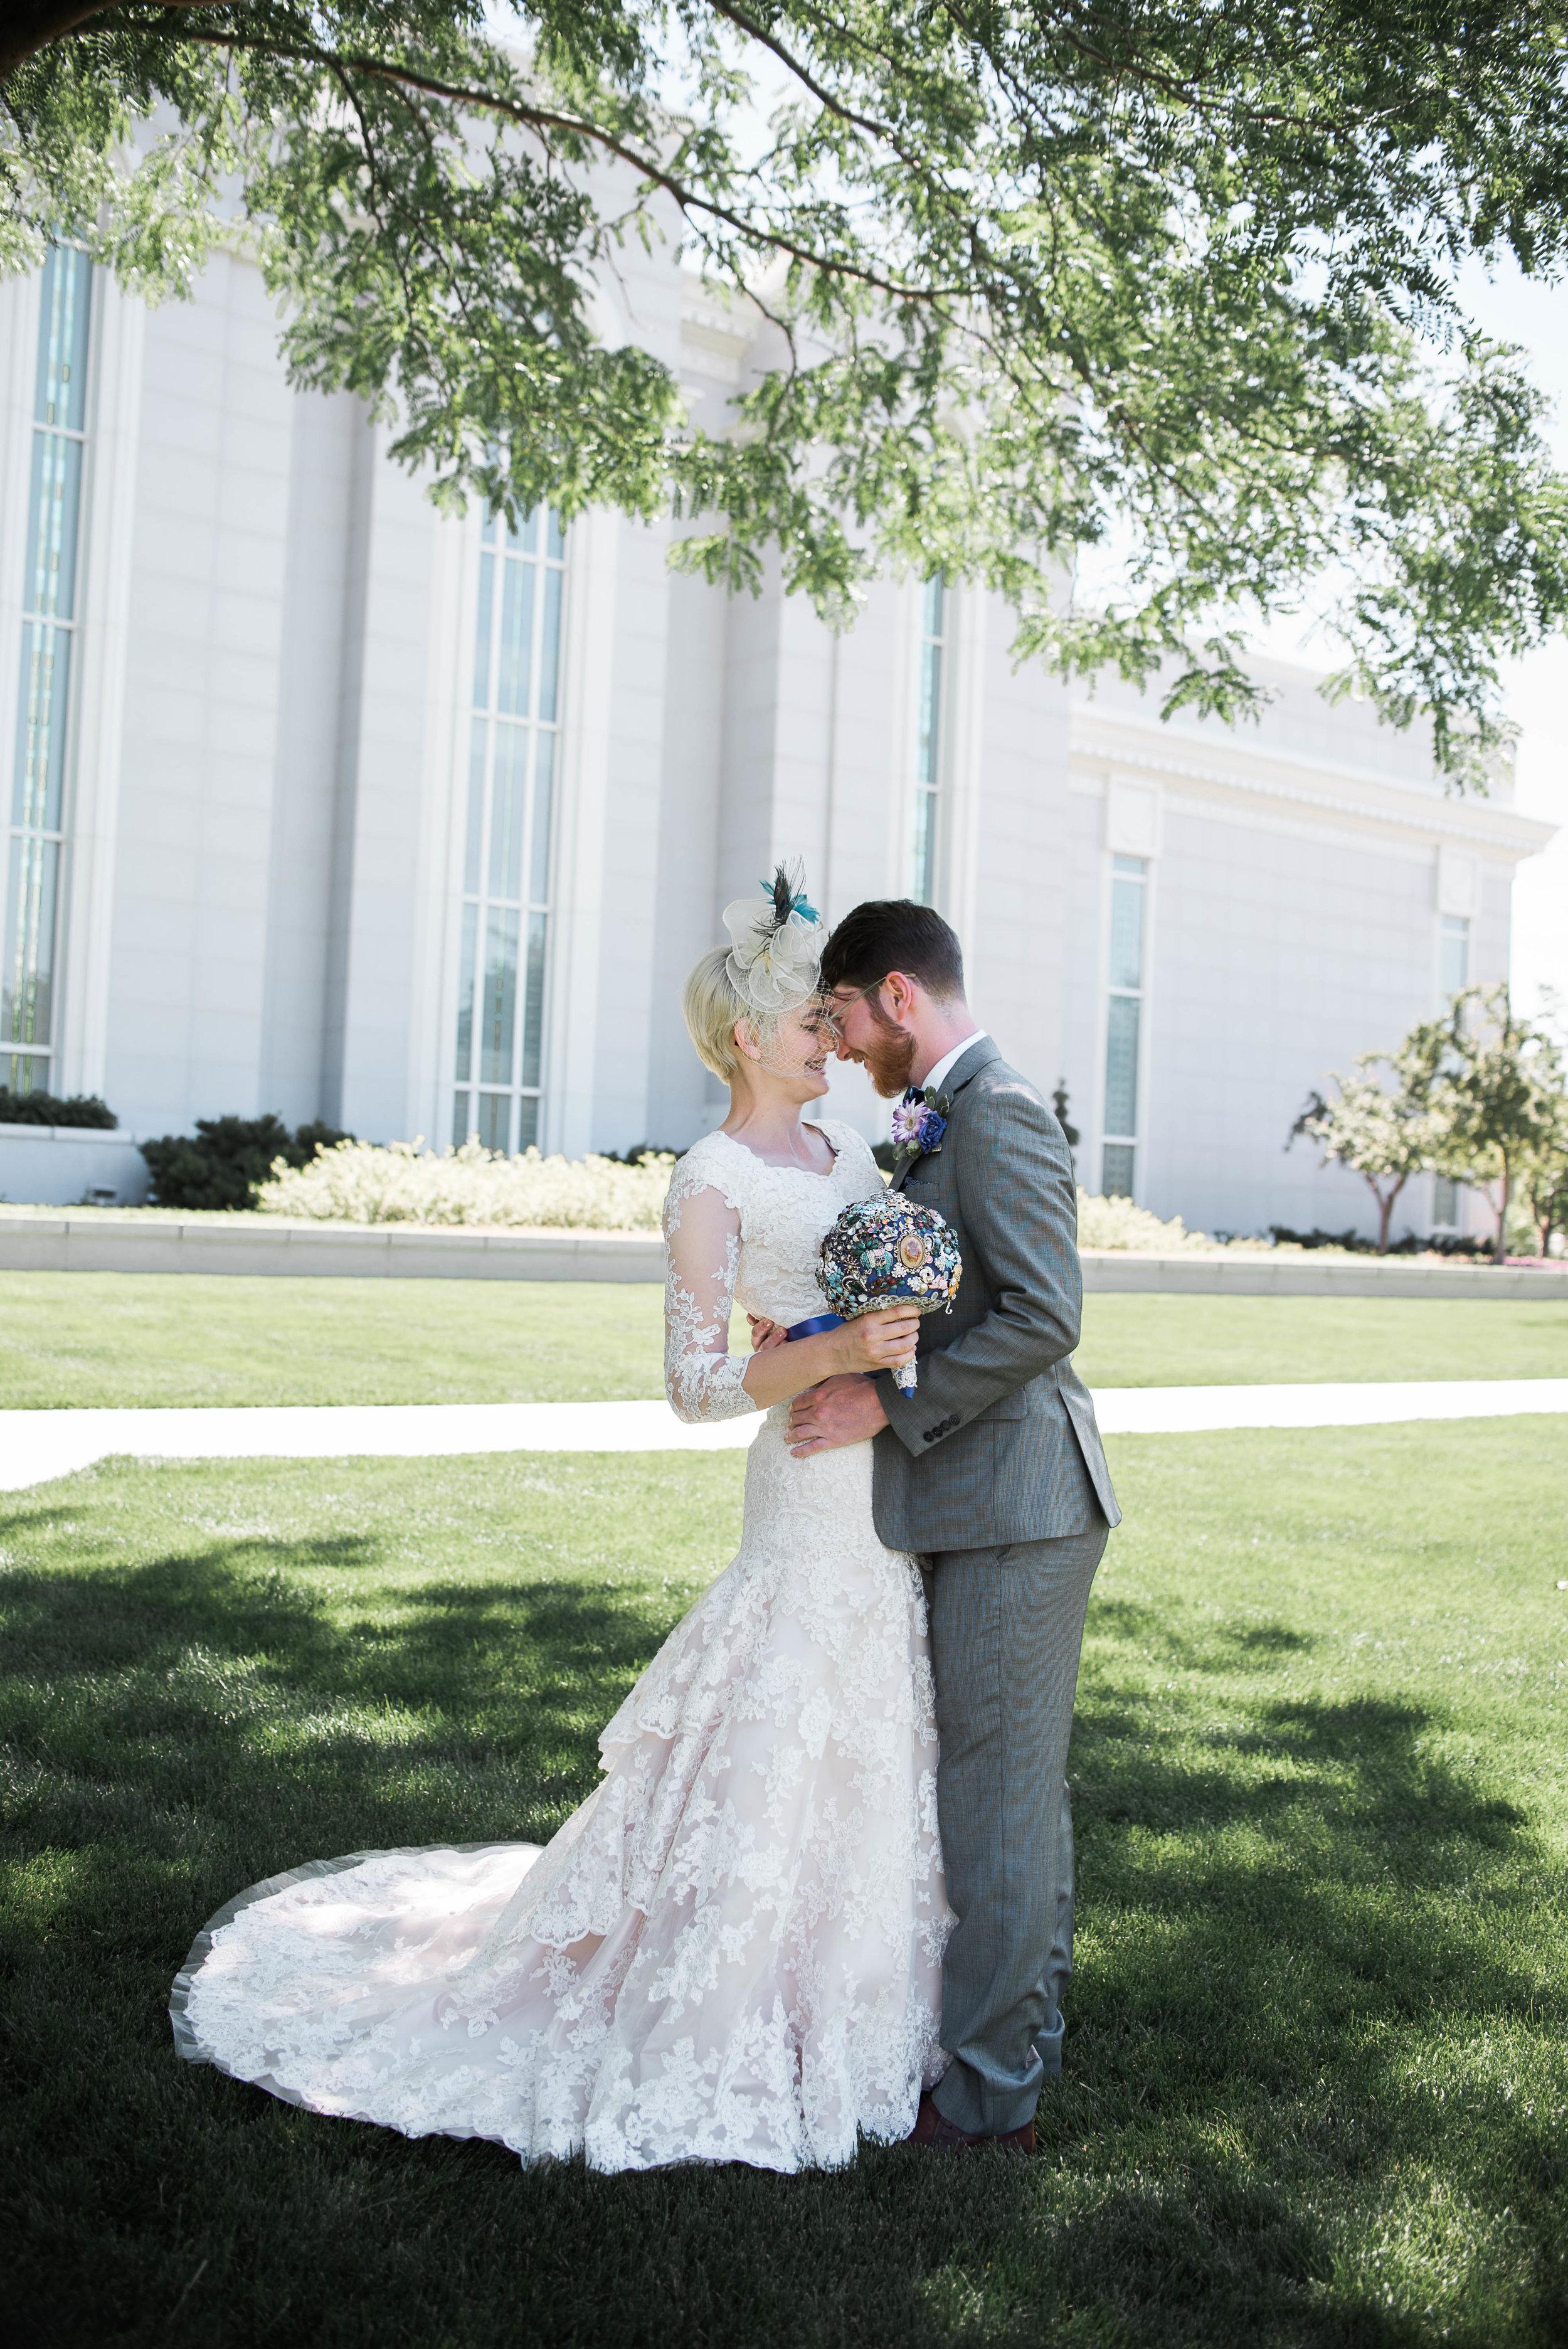 K+M-Wedding-DaySadie_Banks_Photography-539.jpg